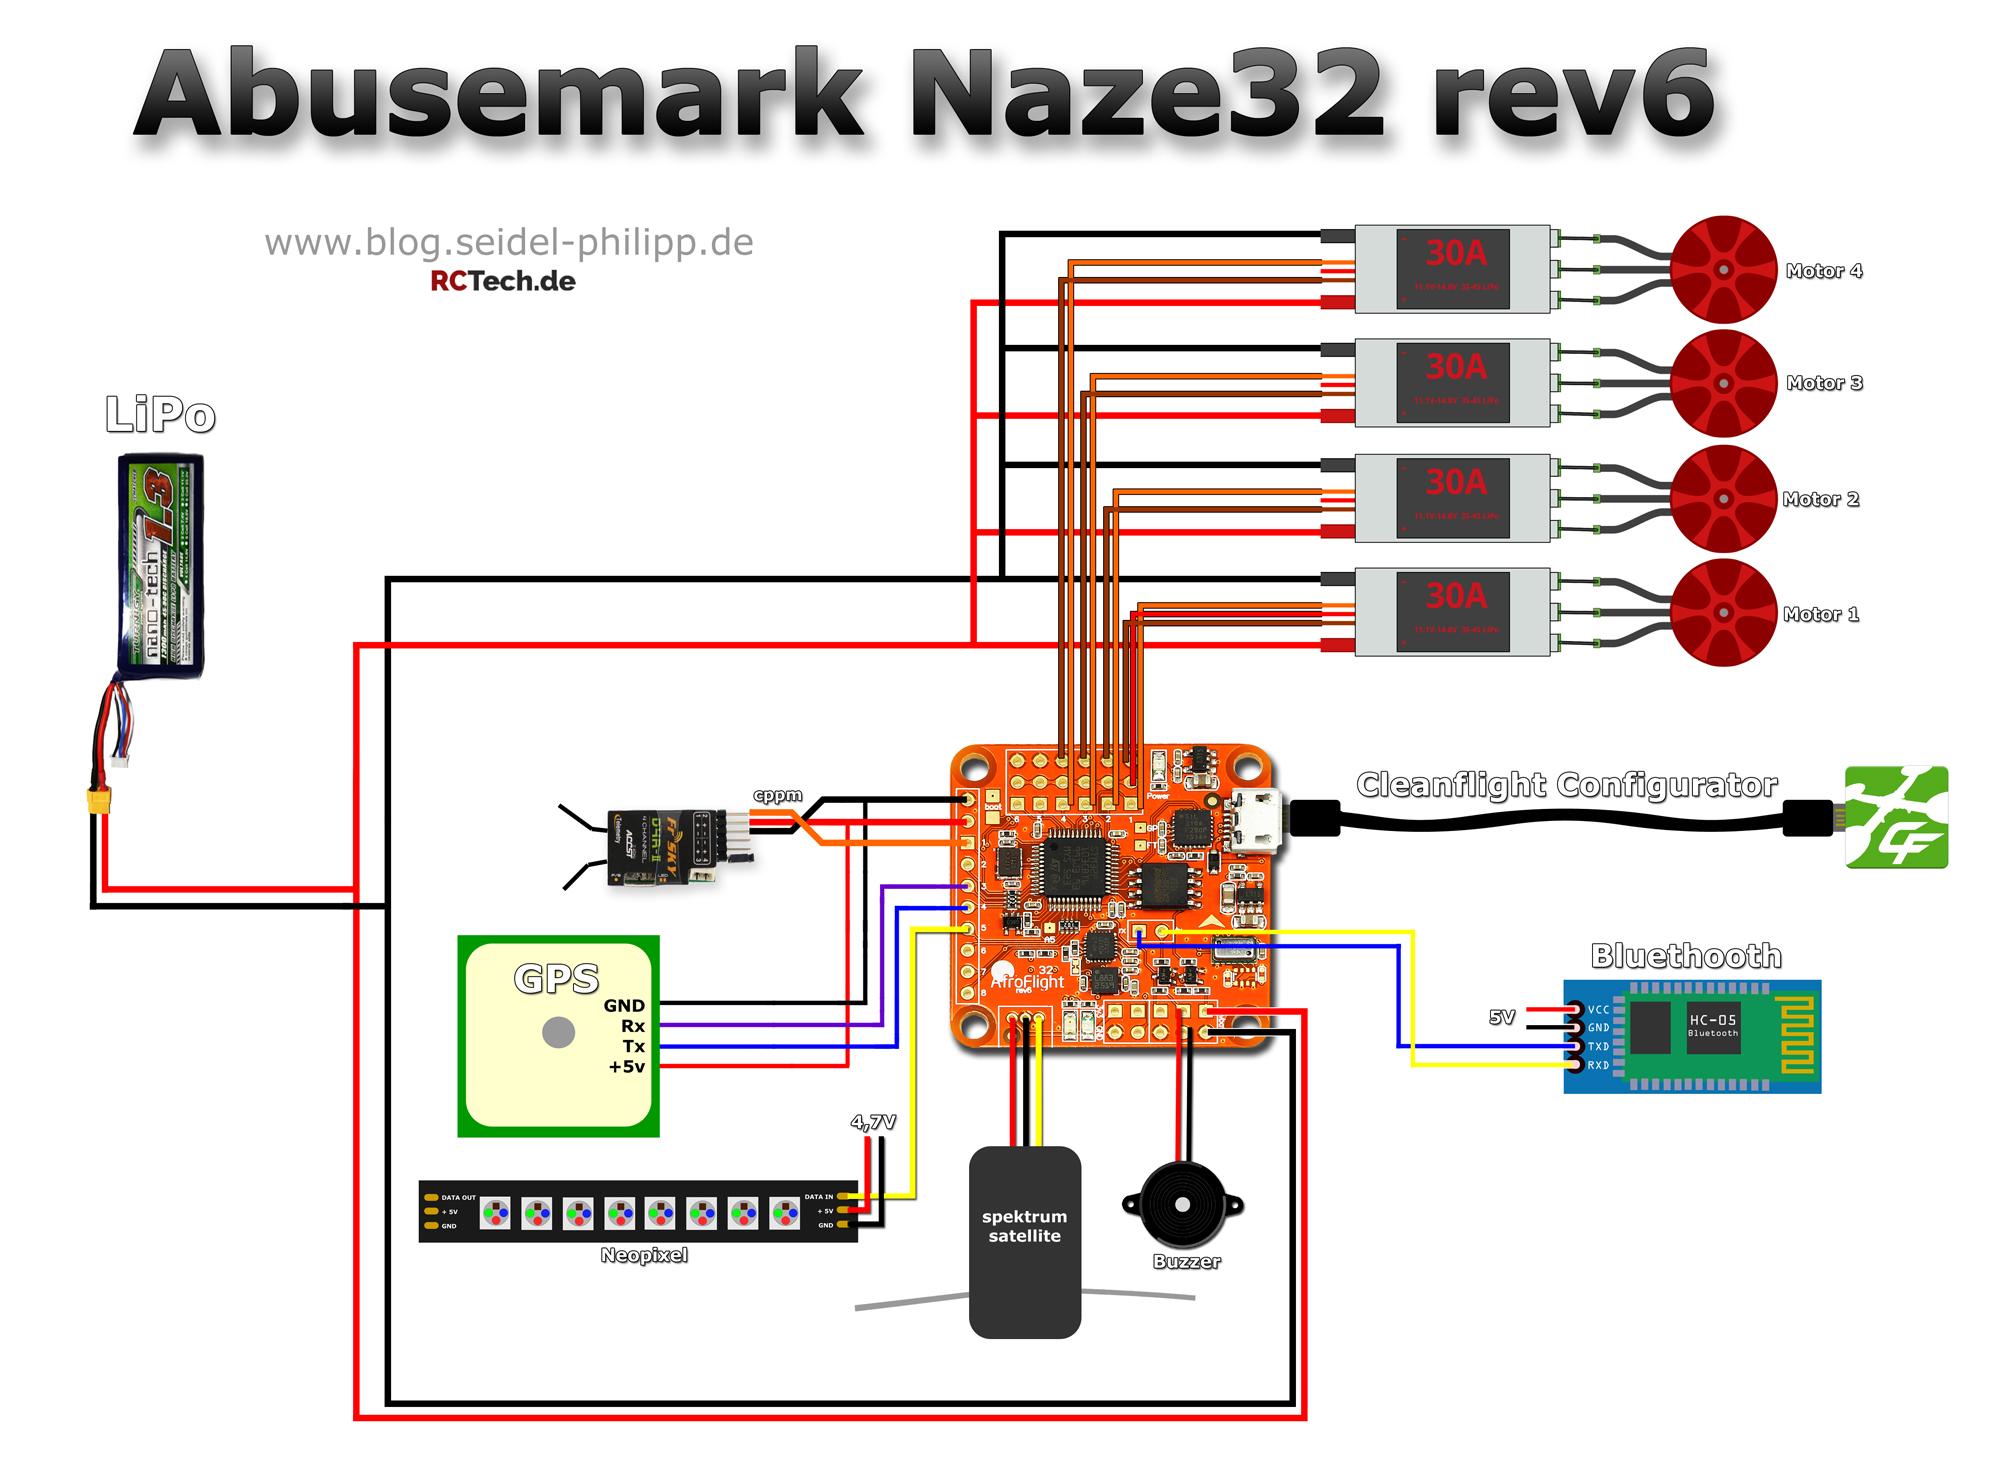 spektrum satellite, rev6 board, rev6 low voltage, pinout rsxr reciever 4 one esc, rev6 gps wiring, oso 250 wiring diagram, rev6 6dof, rev 6 pinout, eachine eb185, wiring diagram, on naze32 wiring diagram